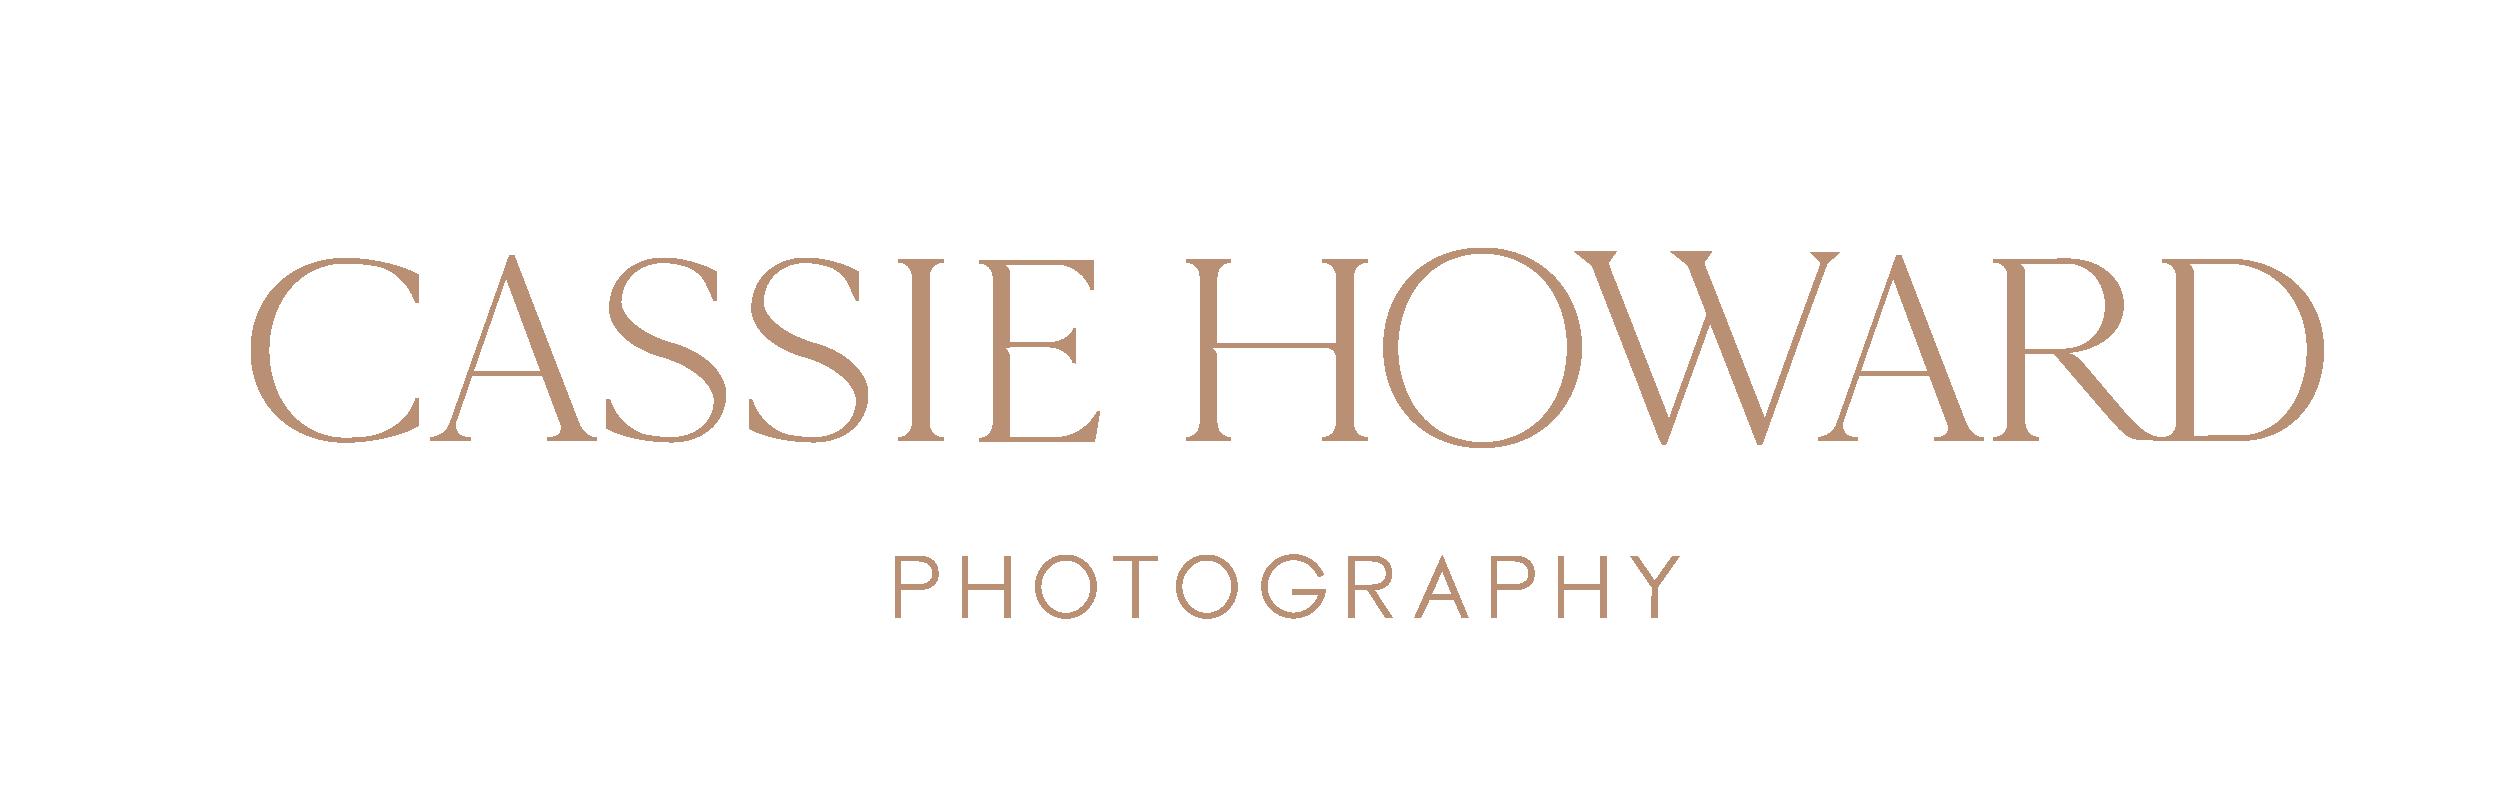 Cassie Howard